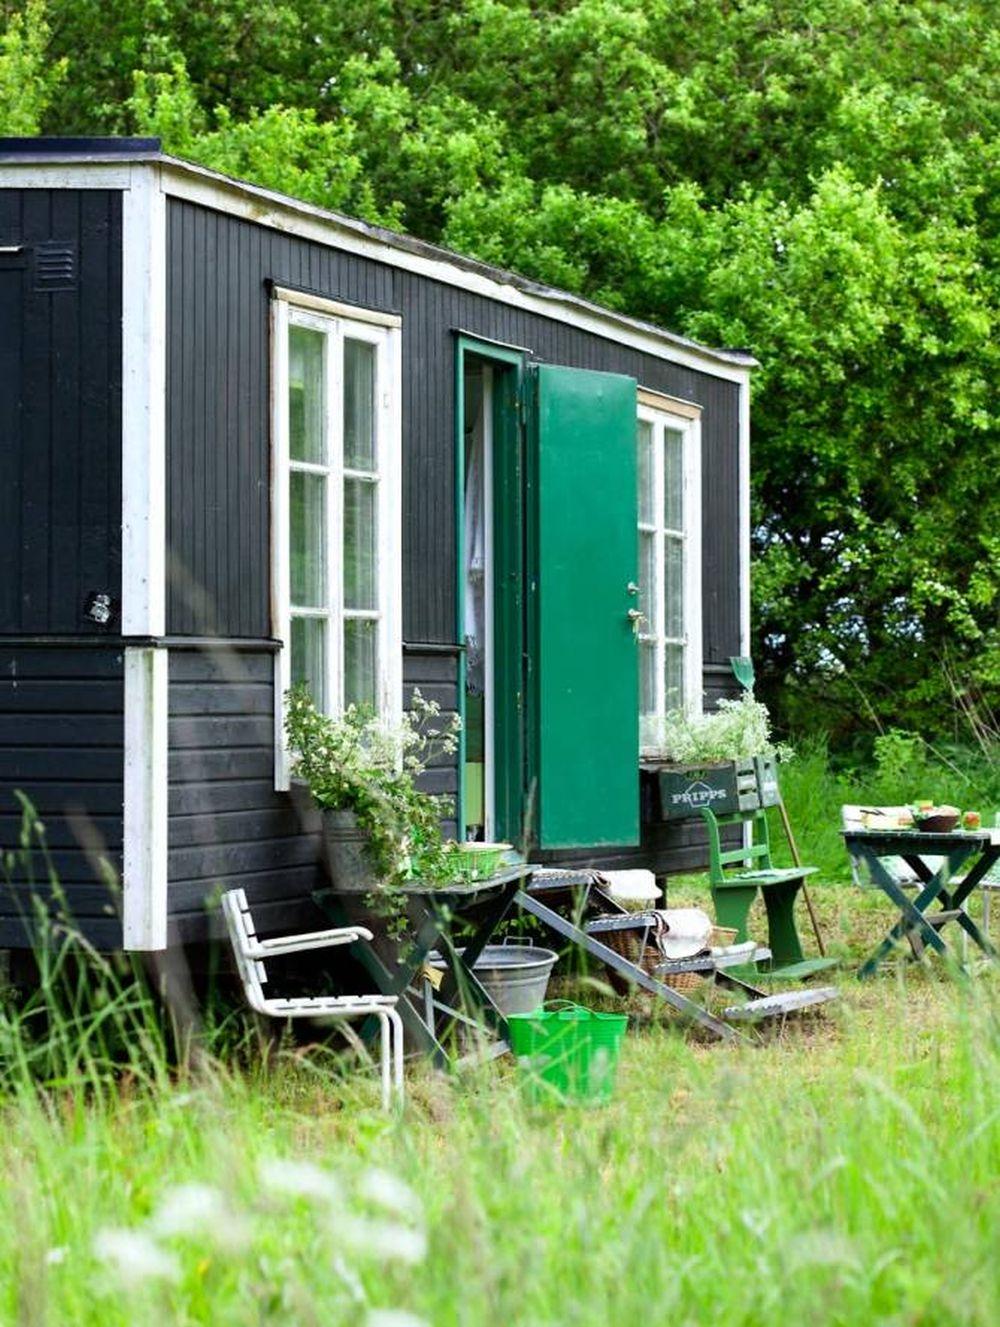 adelaparvu.com despre casa de vacanta pe roti, 18 mp, Suedia, Foto Minna Mercke-Schmidt (2)